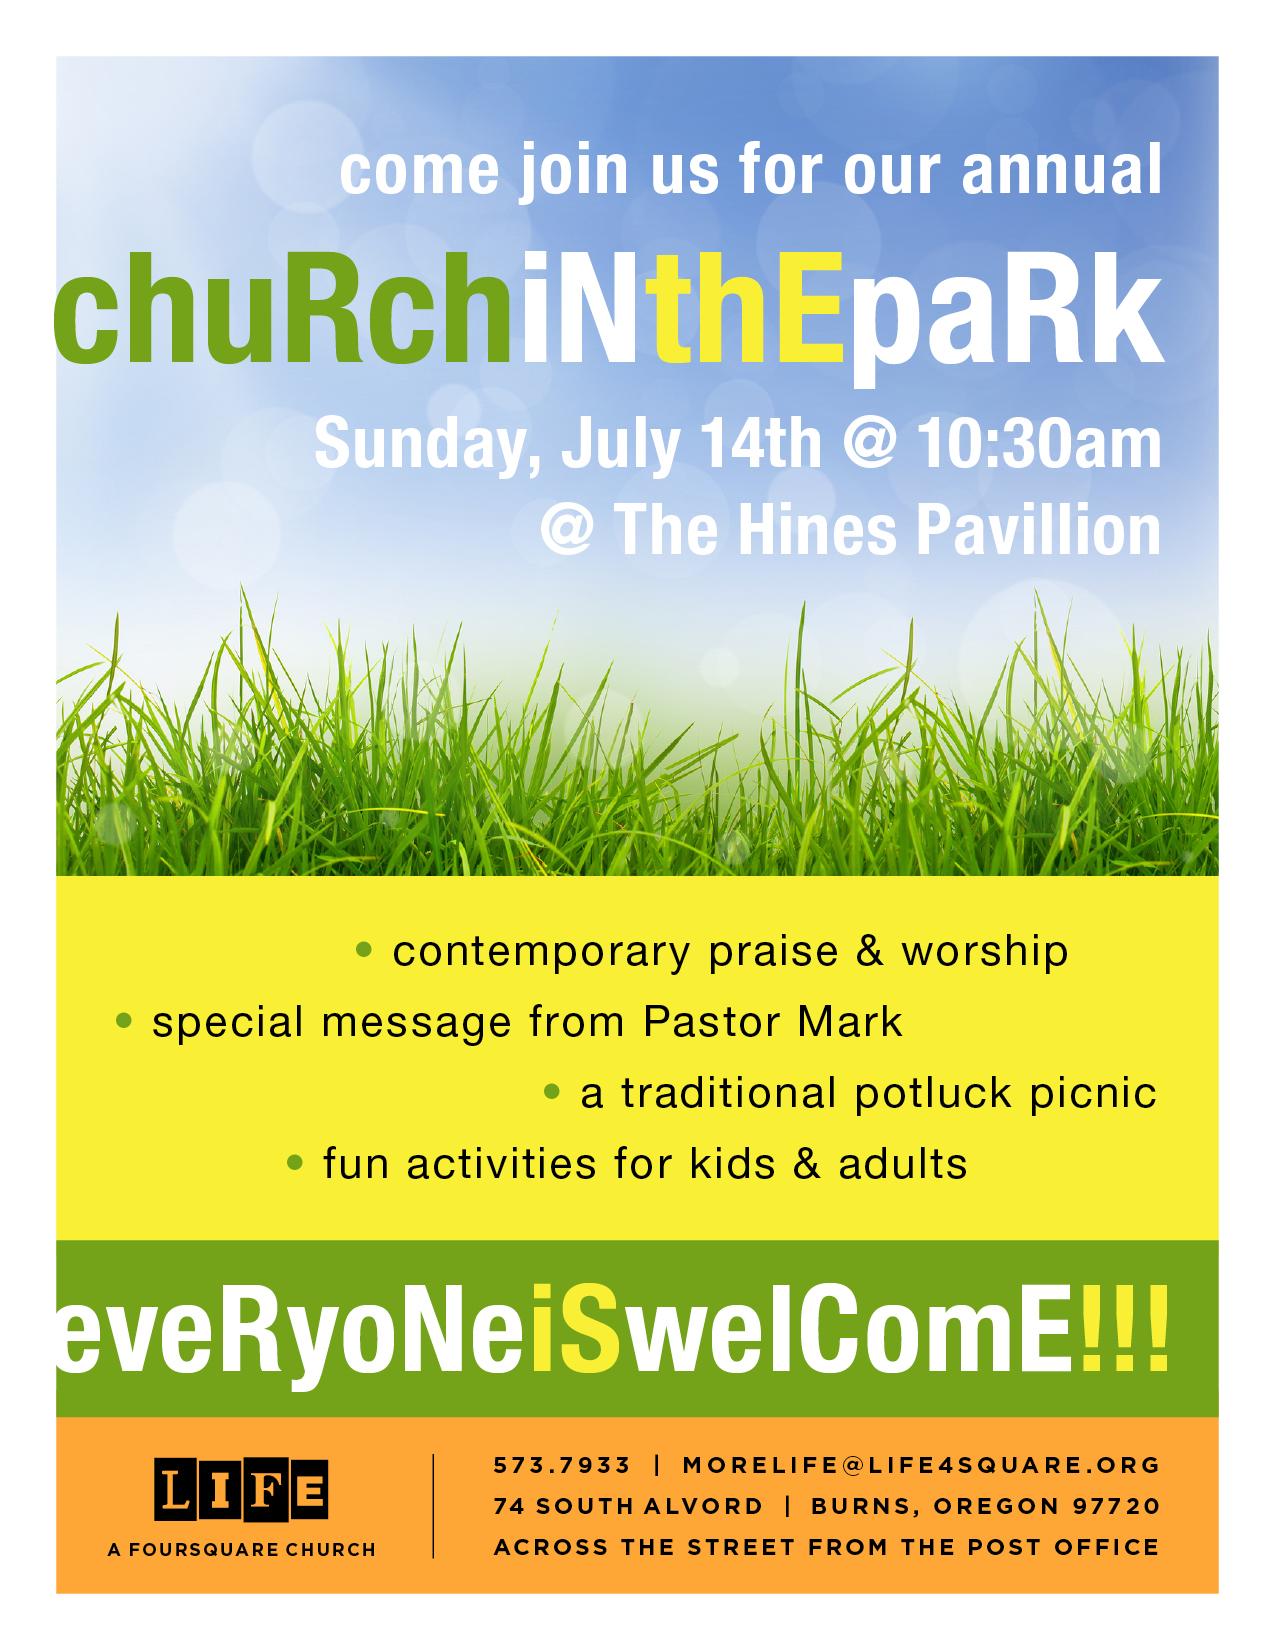 ChurchInThePark_Poster_8.5x11 (002).jpg